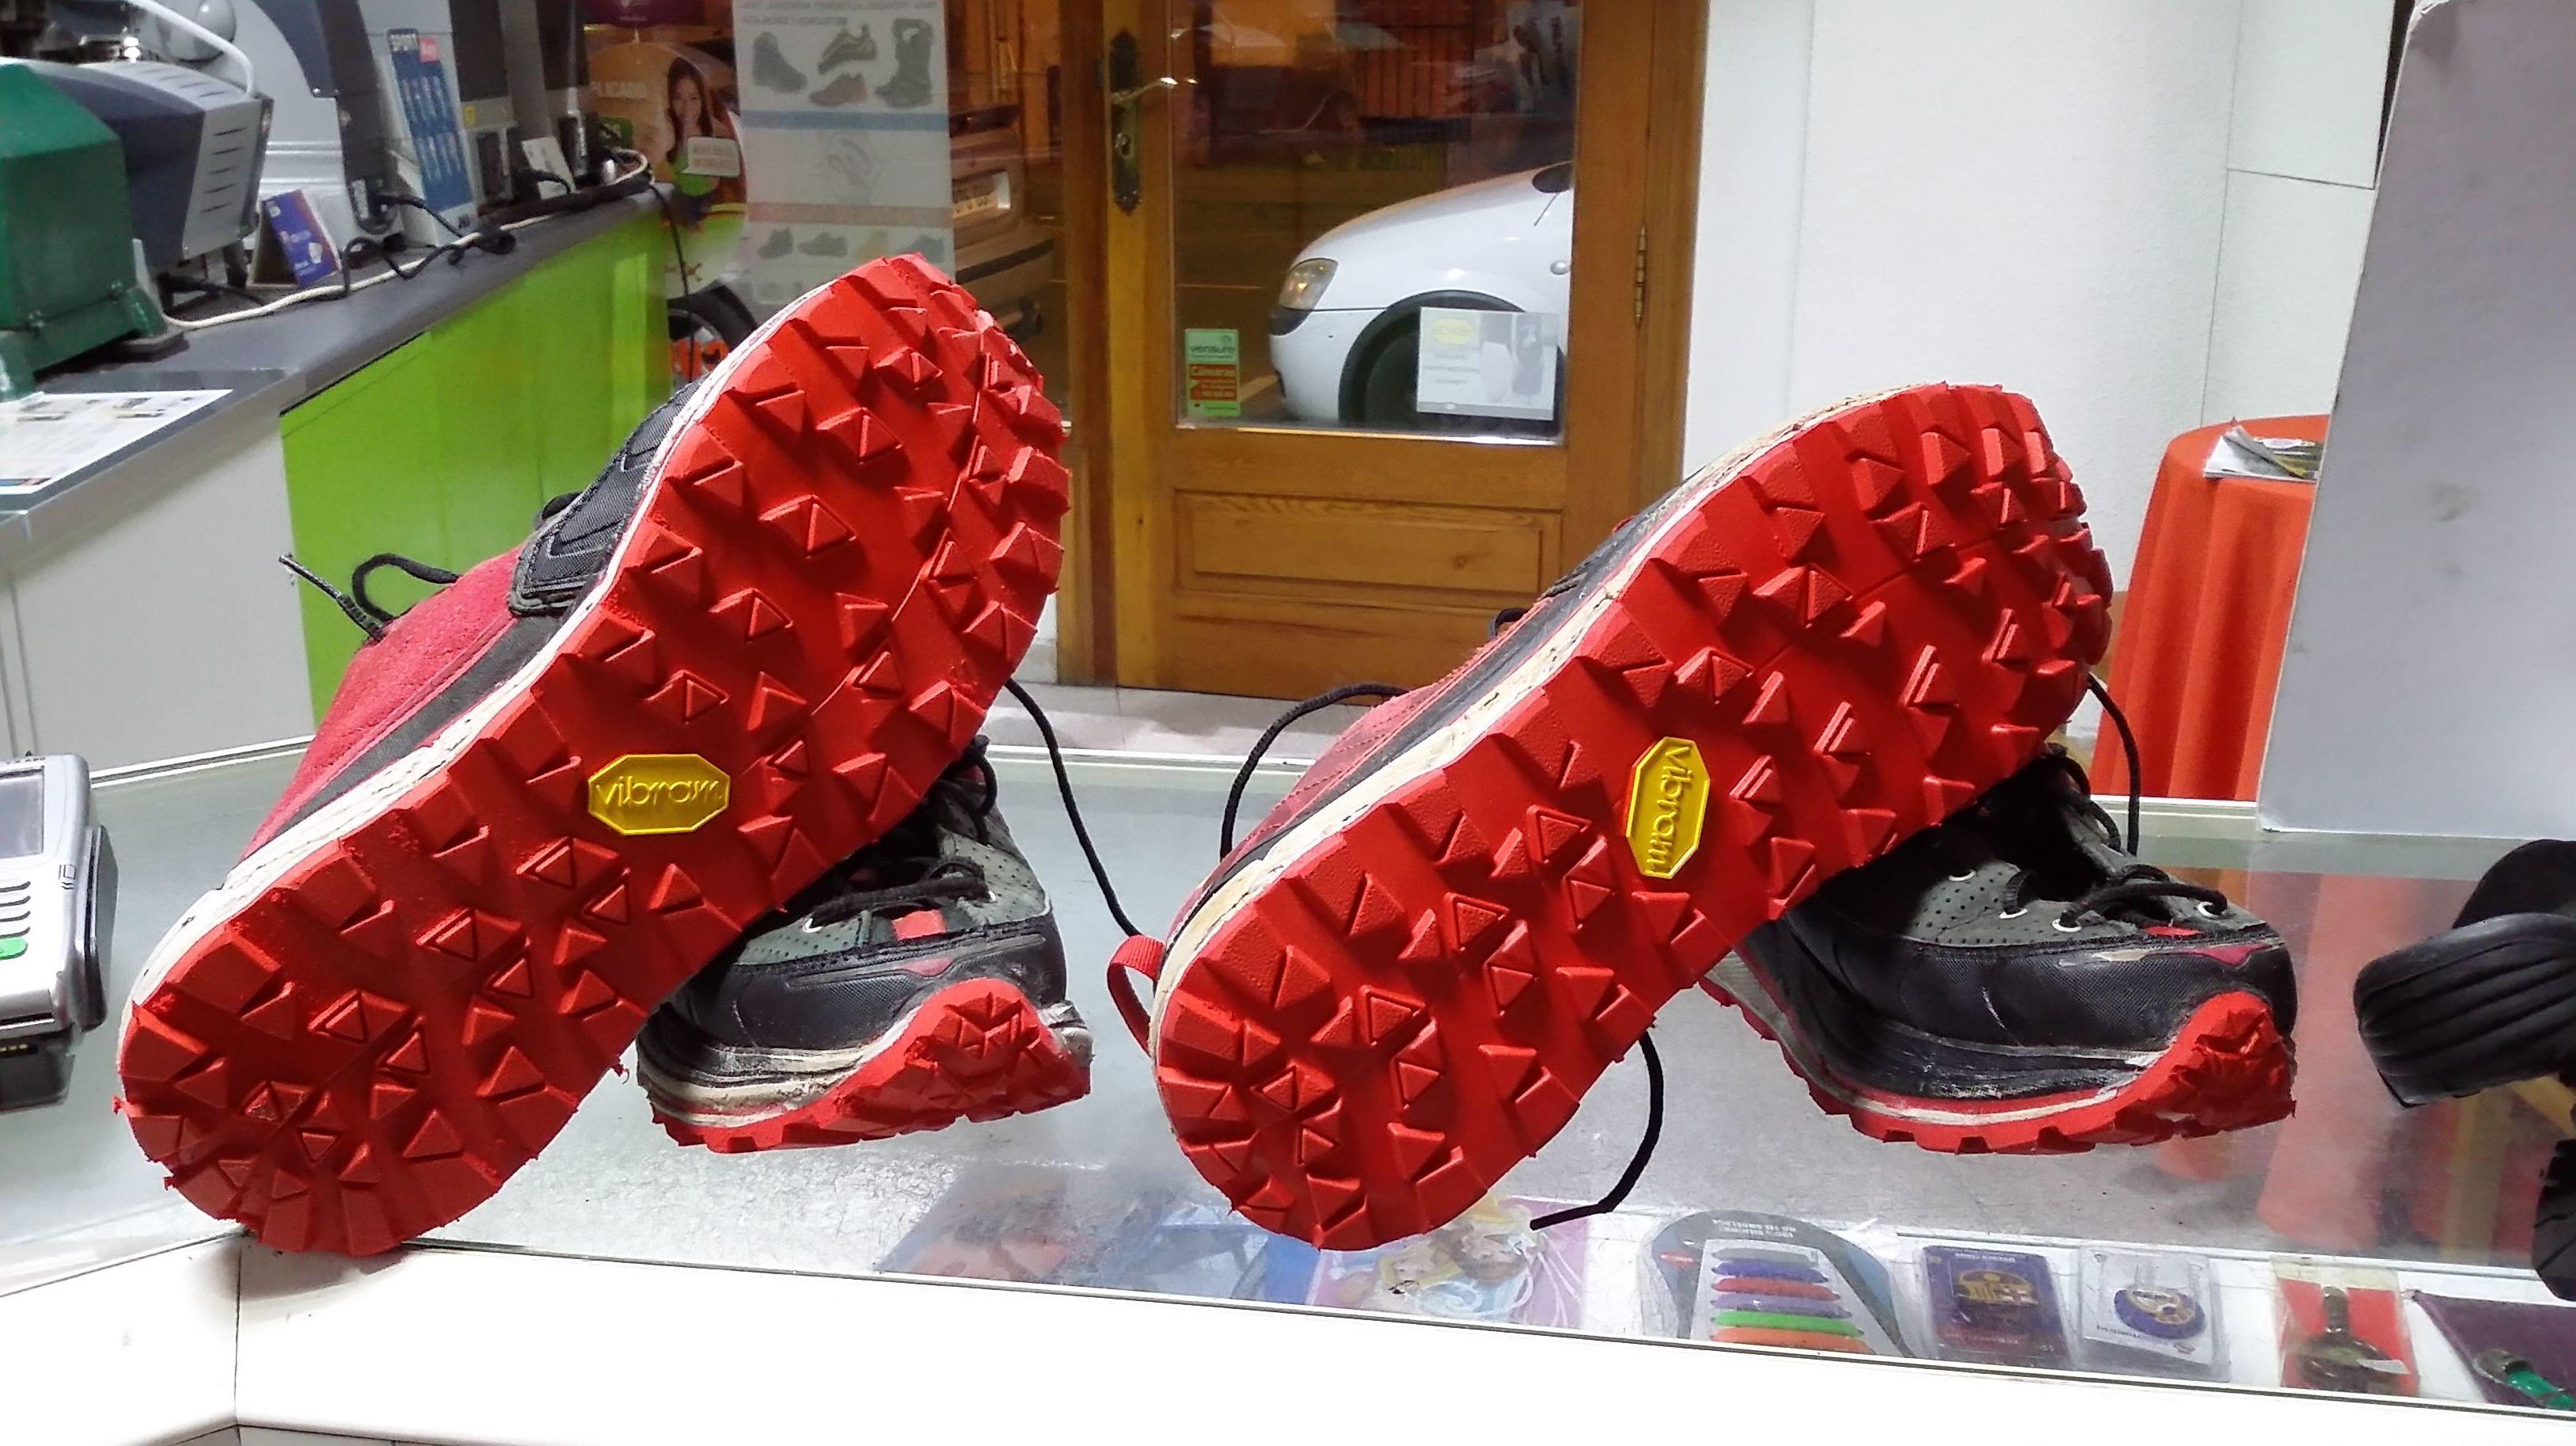 Foto 5 de Reparación de calzado en Castellón | Roig Vidal